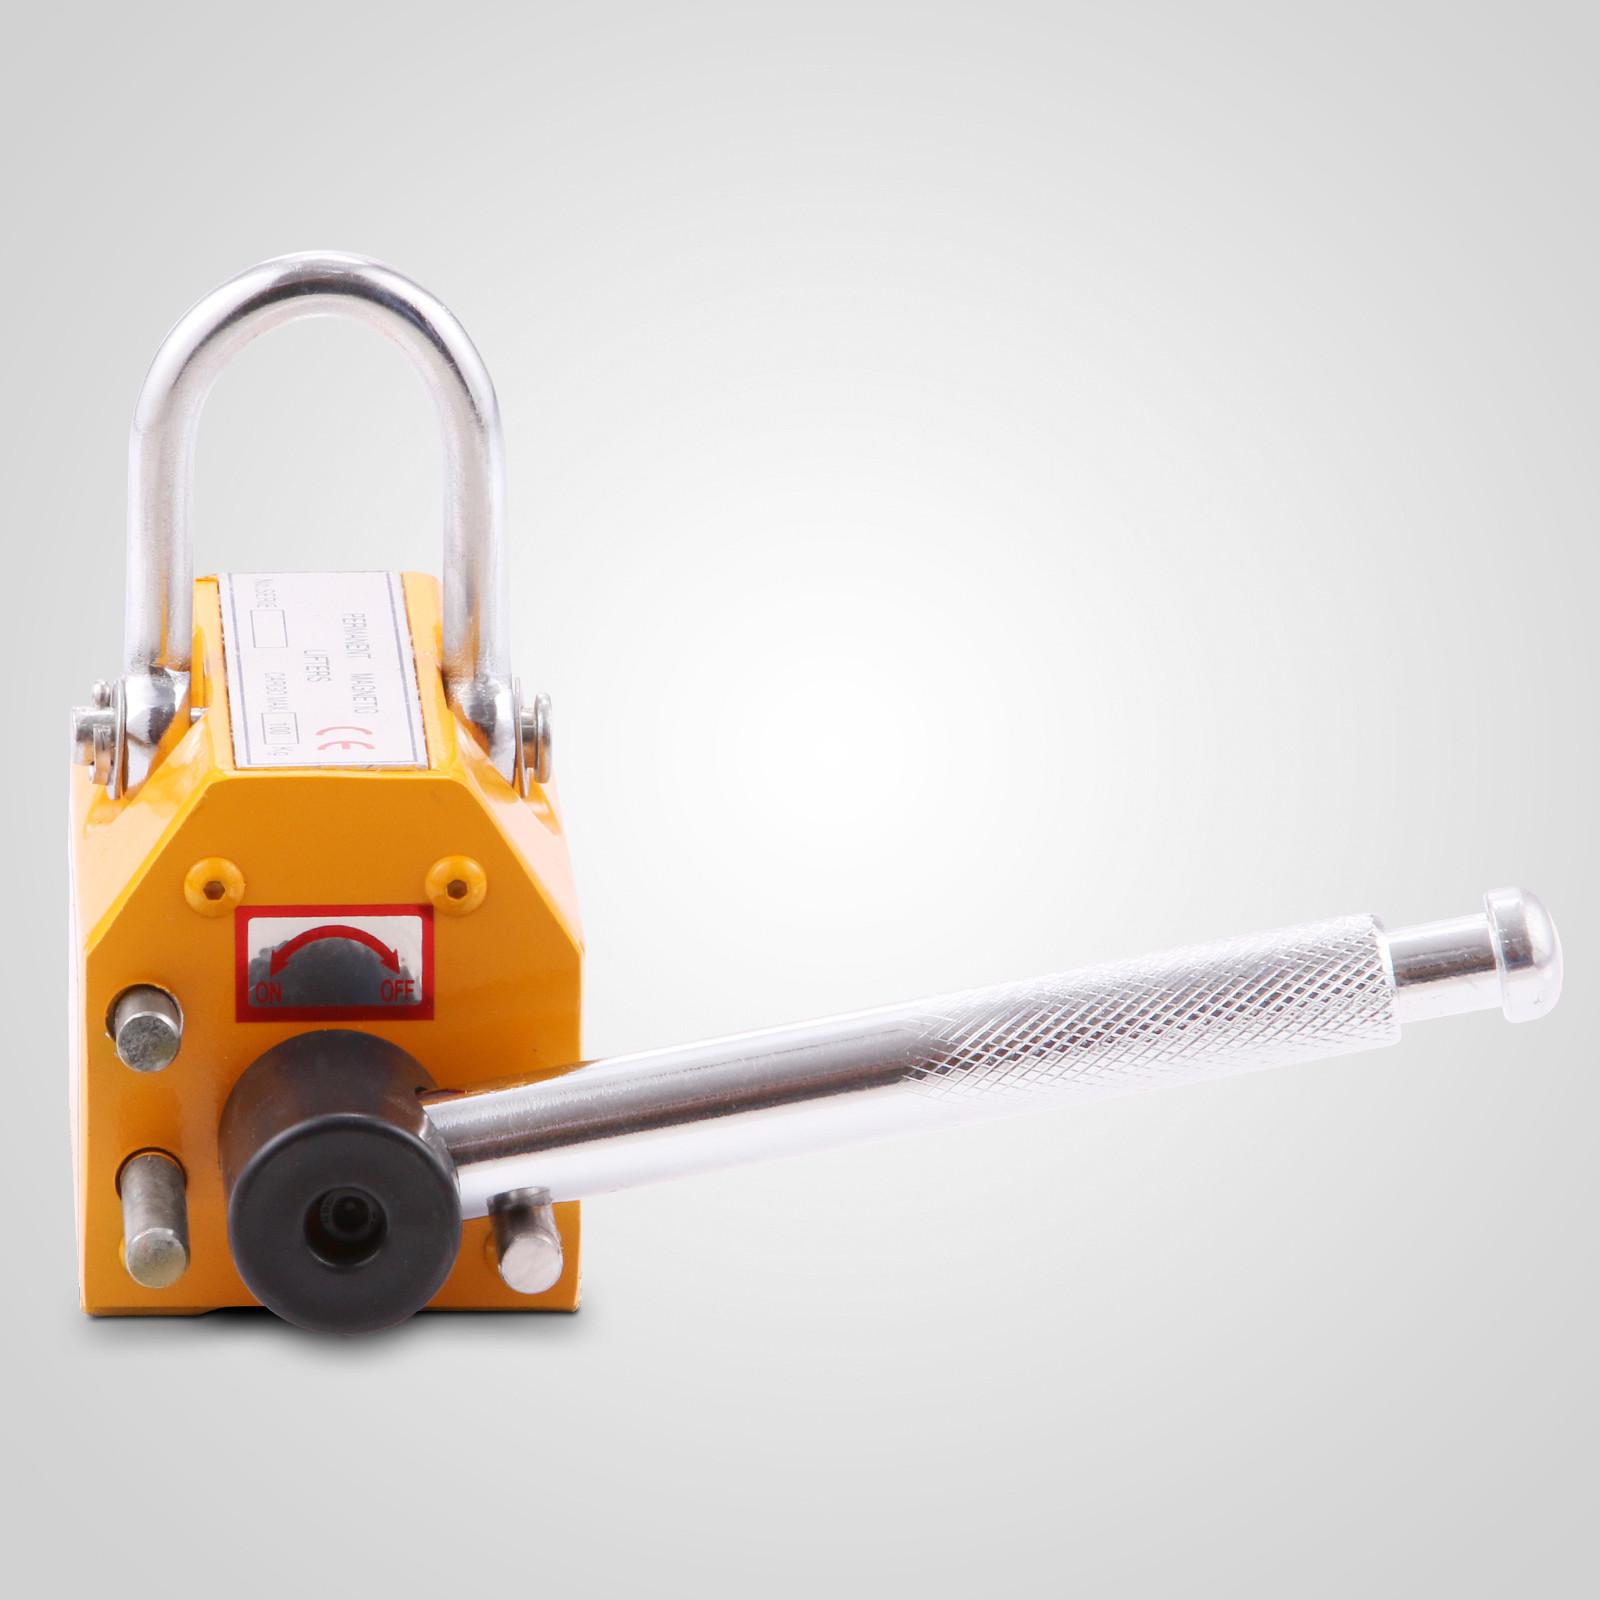 100-300-600-1000KG-Steel-Magnetic-Lifter-Heavy-Duty-Crane-Hoist-Lifting-Magnet miniature 20